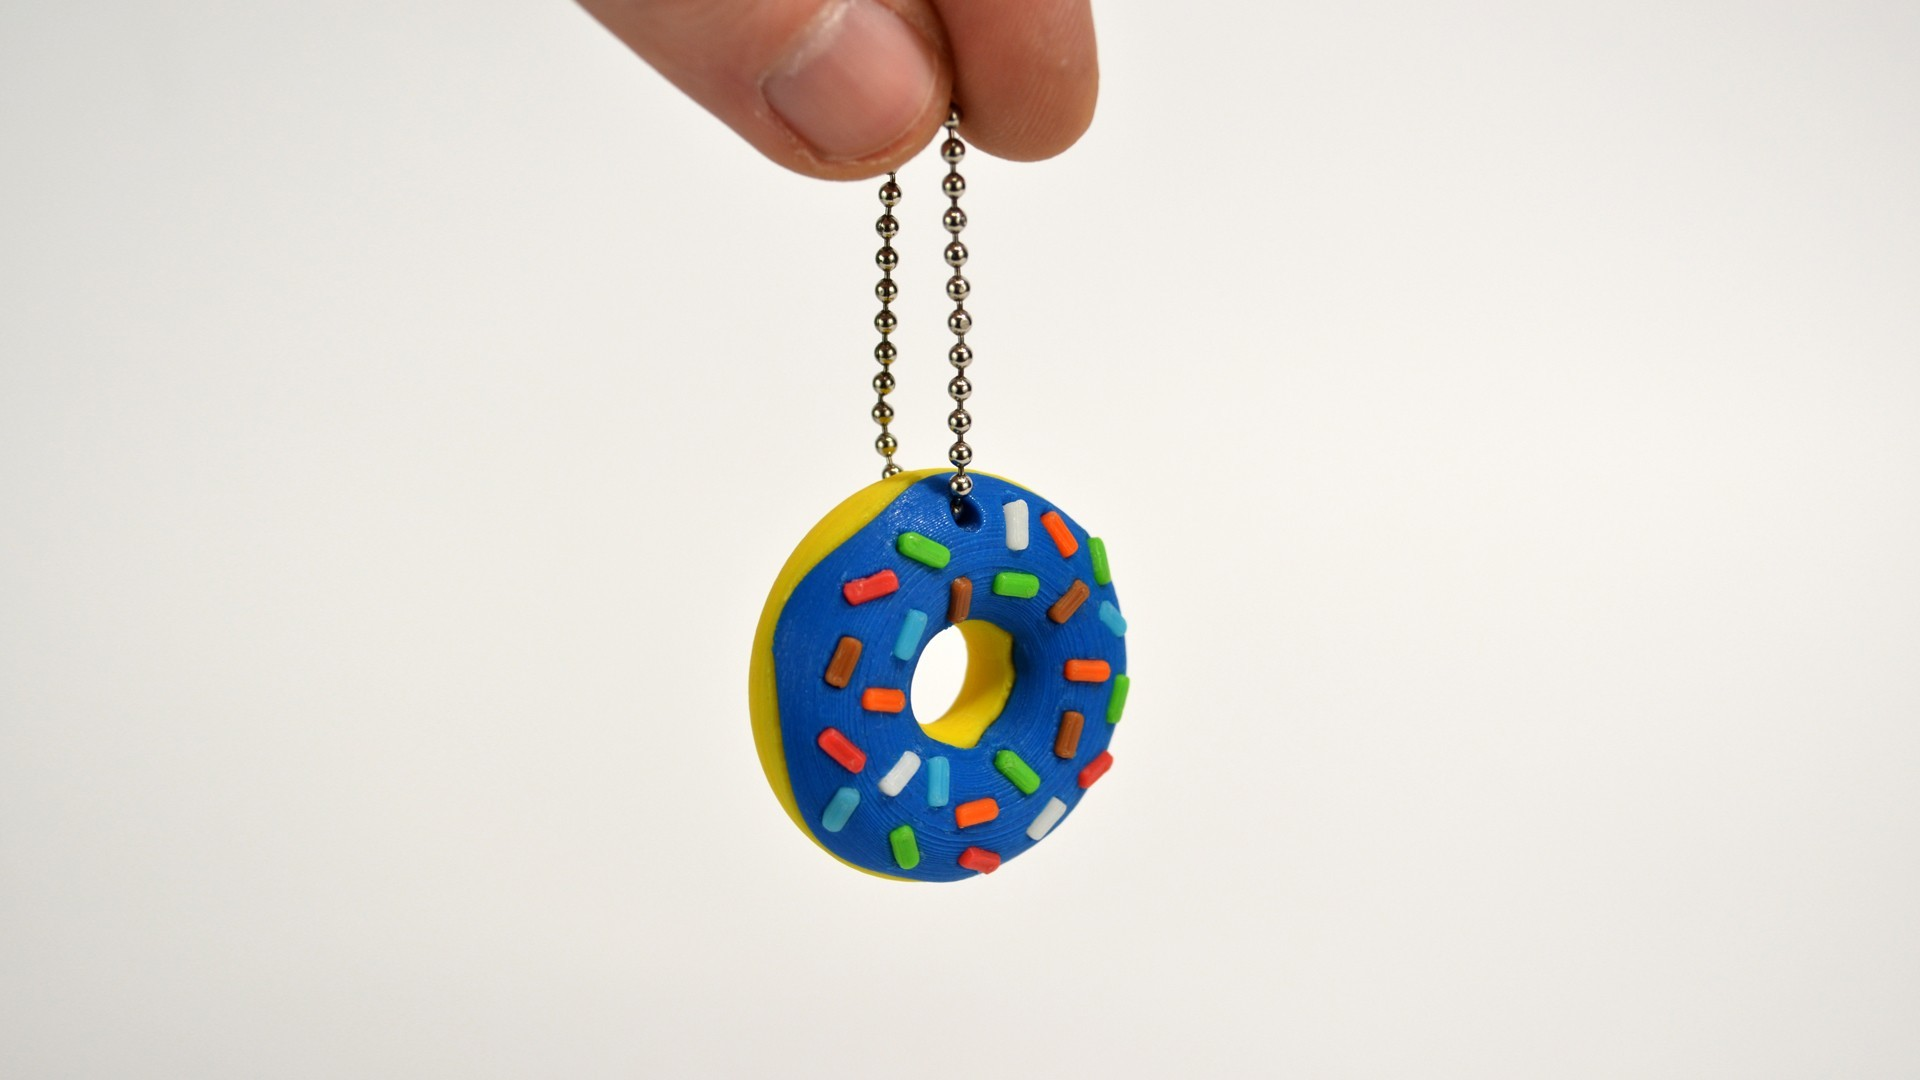 donuts_01_.jpg Download free STL file Donut Keychain • 3D printer design, 2be3d